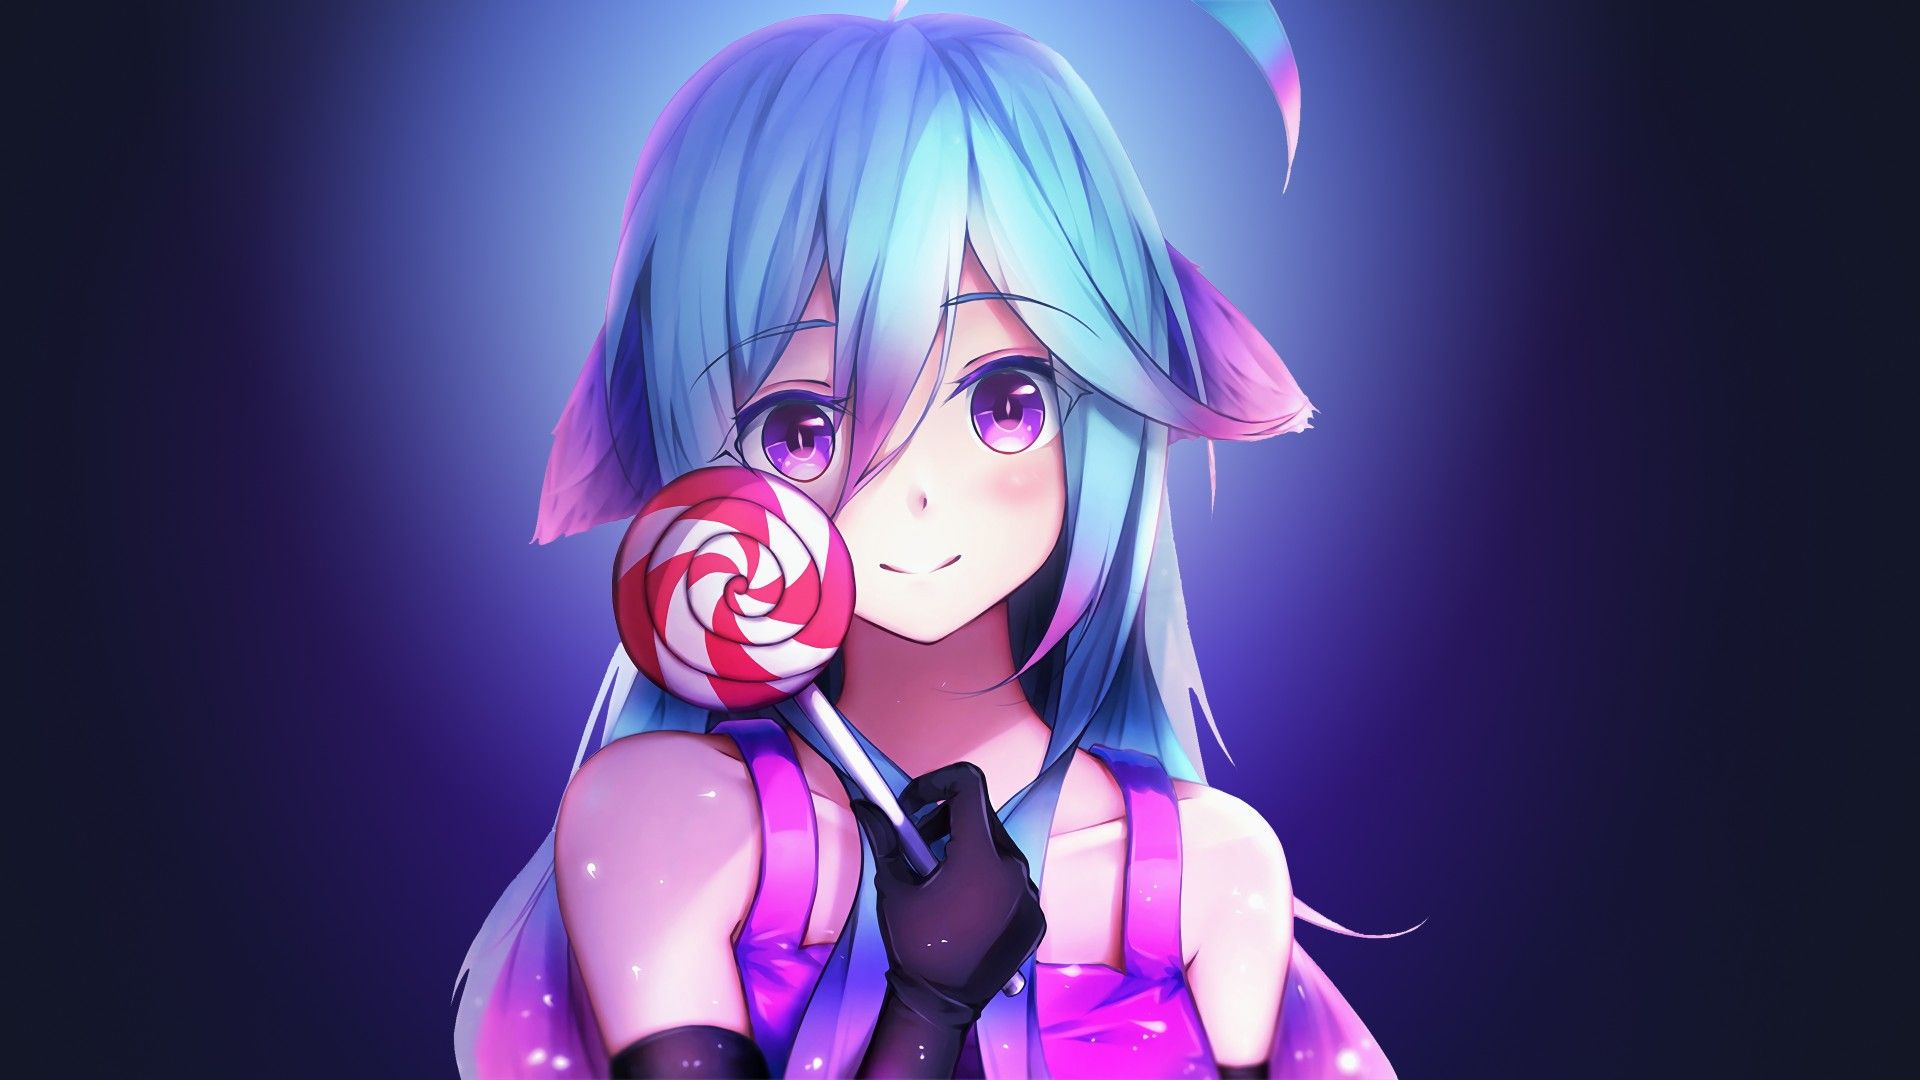 Download Wallpapers Of Anime Girl Lollipop 4k Anime 4923